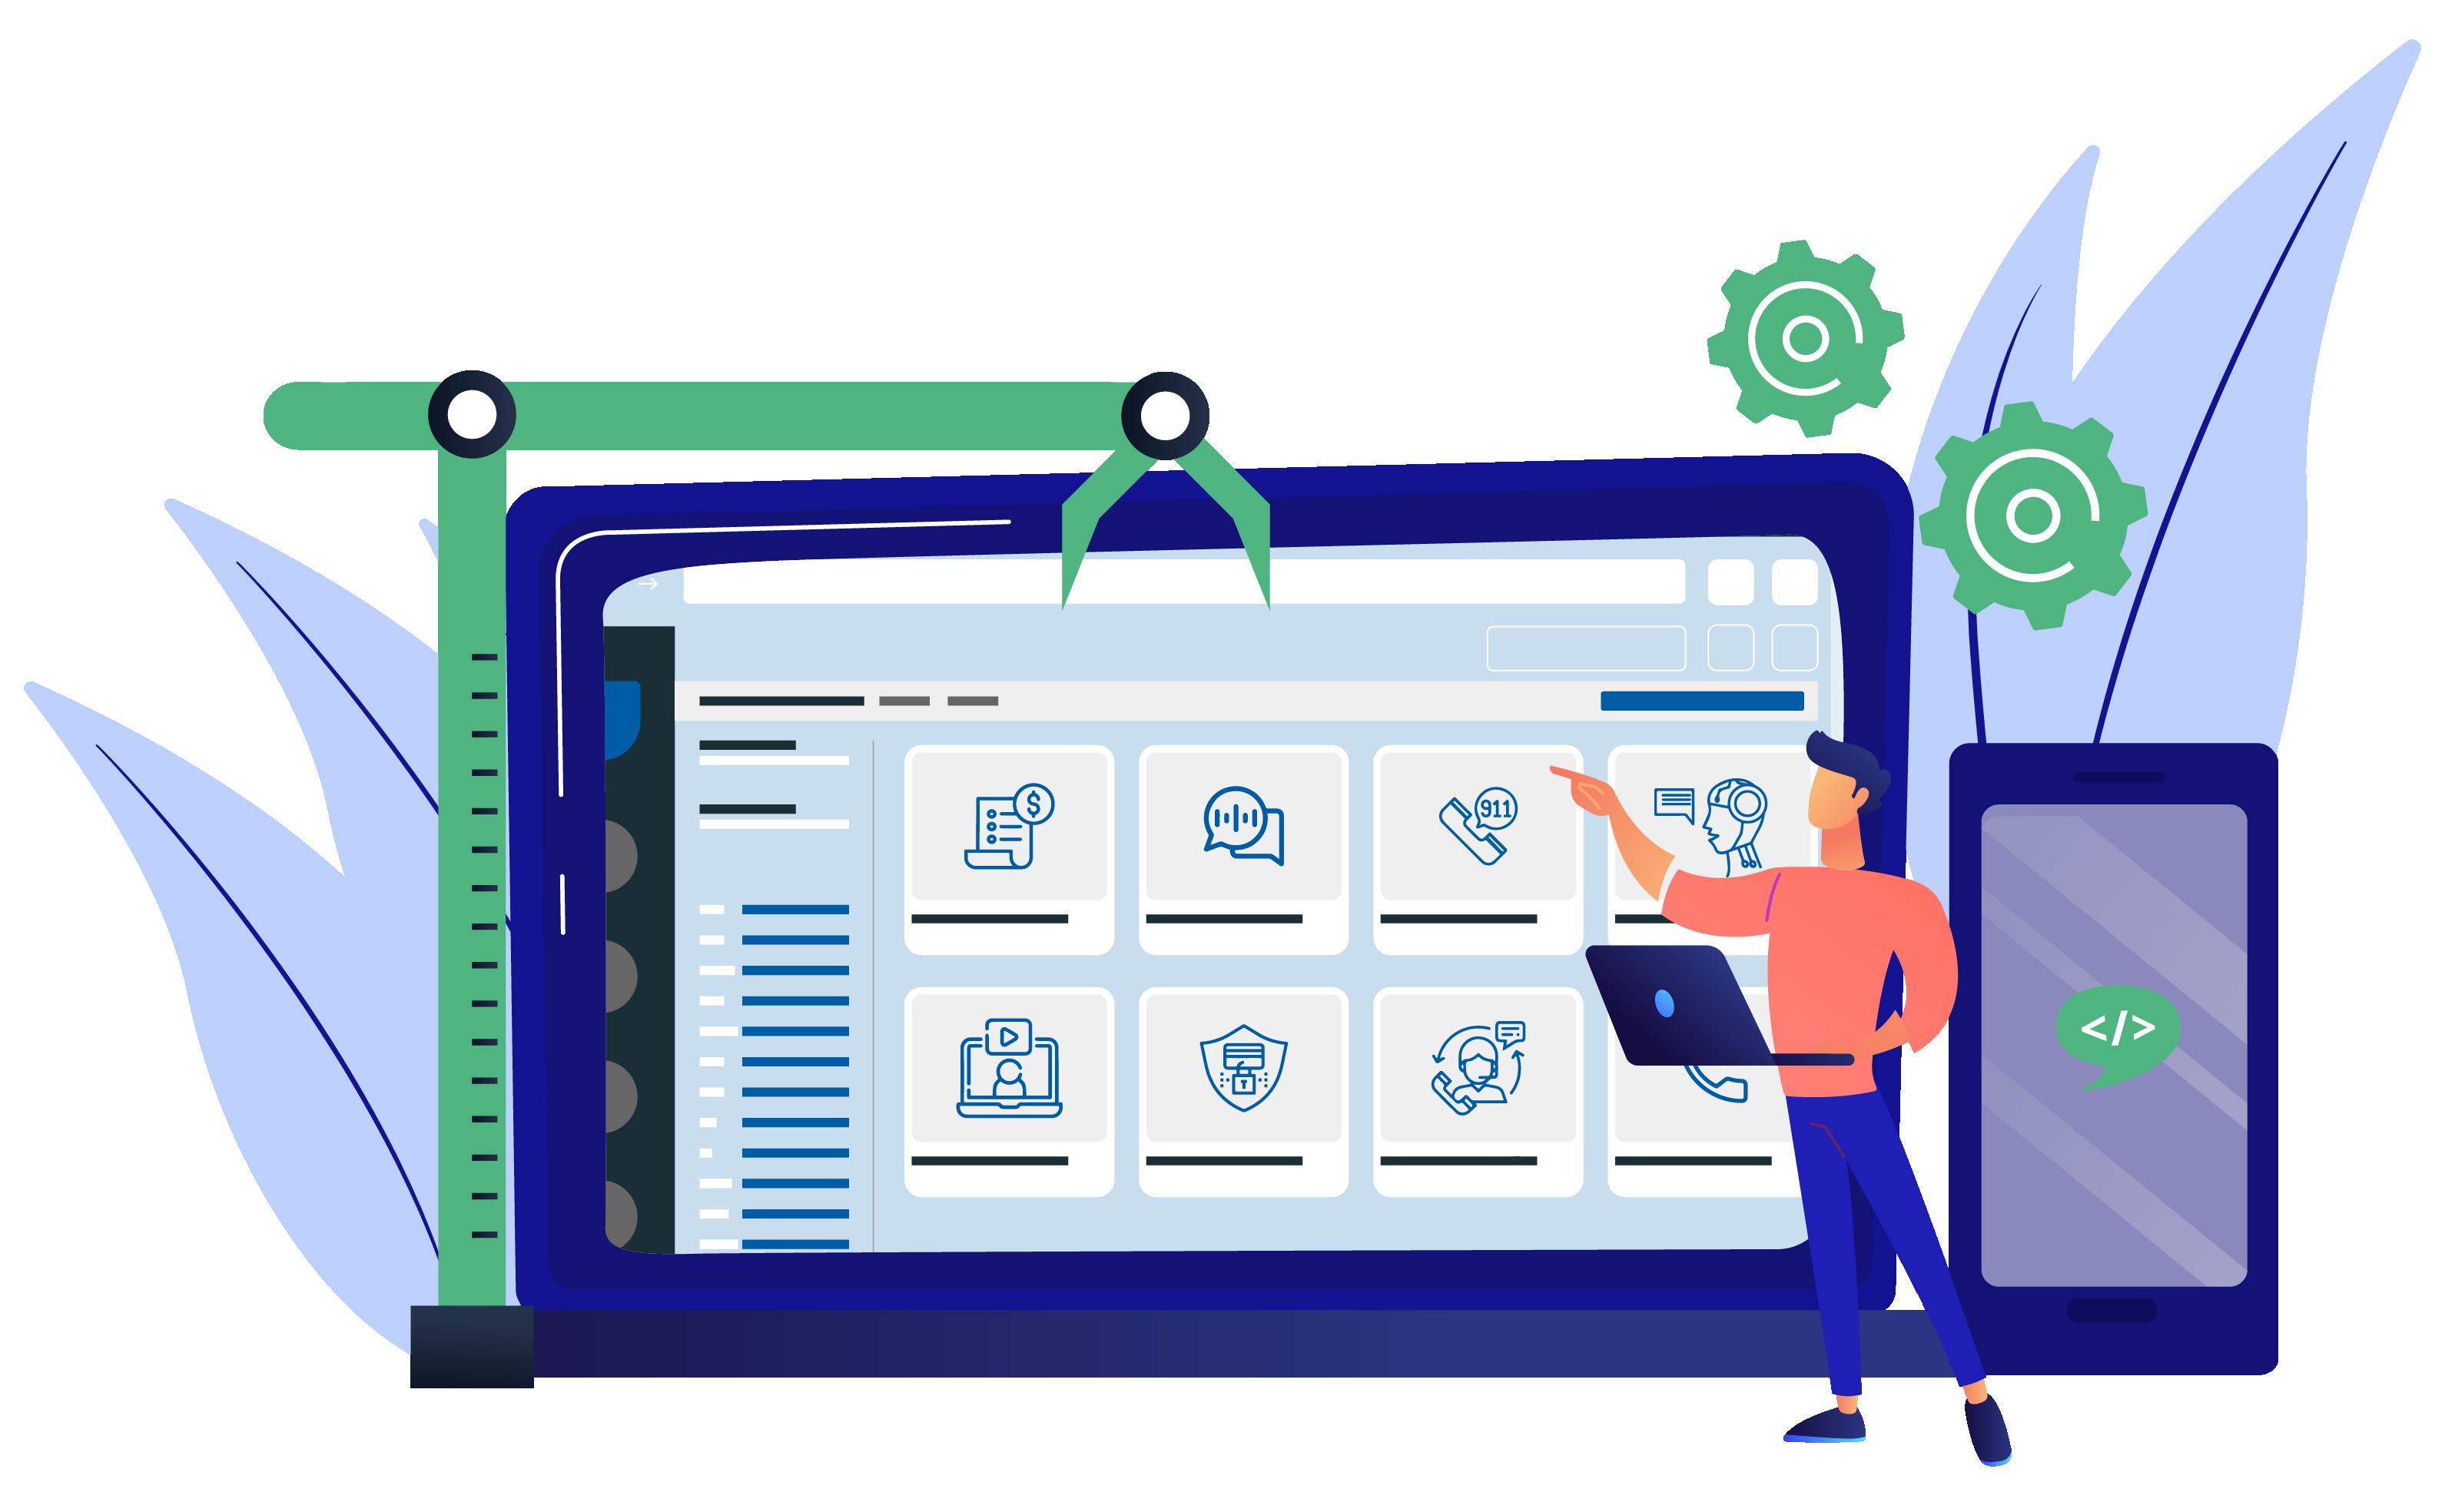 Communication APIs on desktop and mobile phone